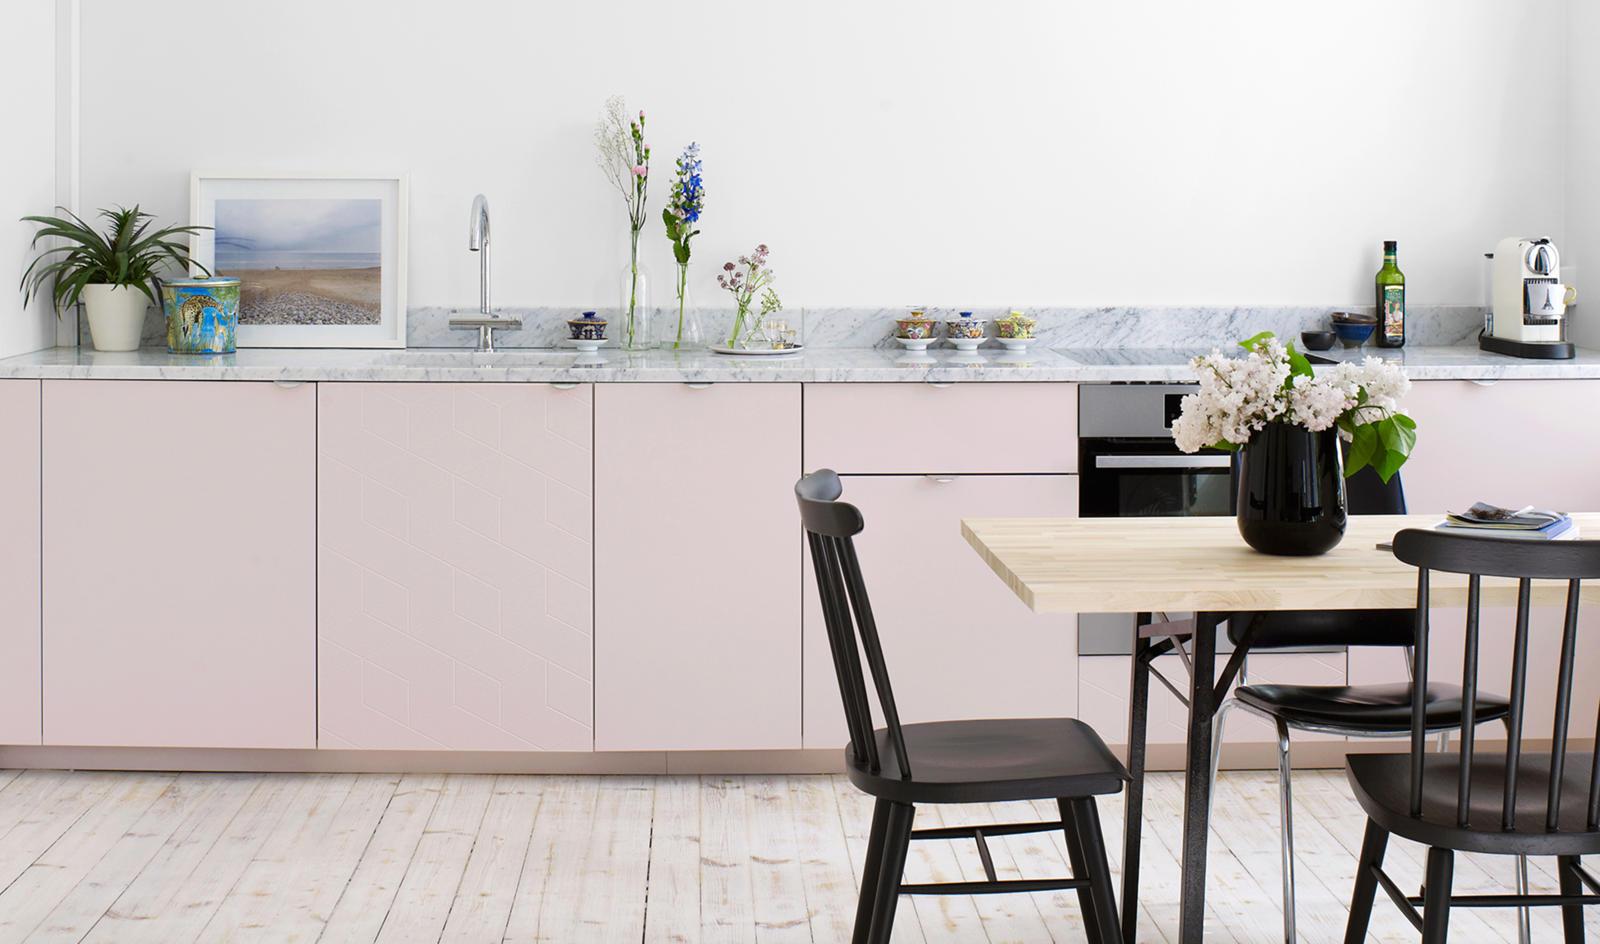 superfront-pink-kitchen-pattern-illusion-holywafer-steel.jpg